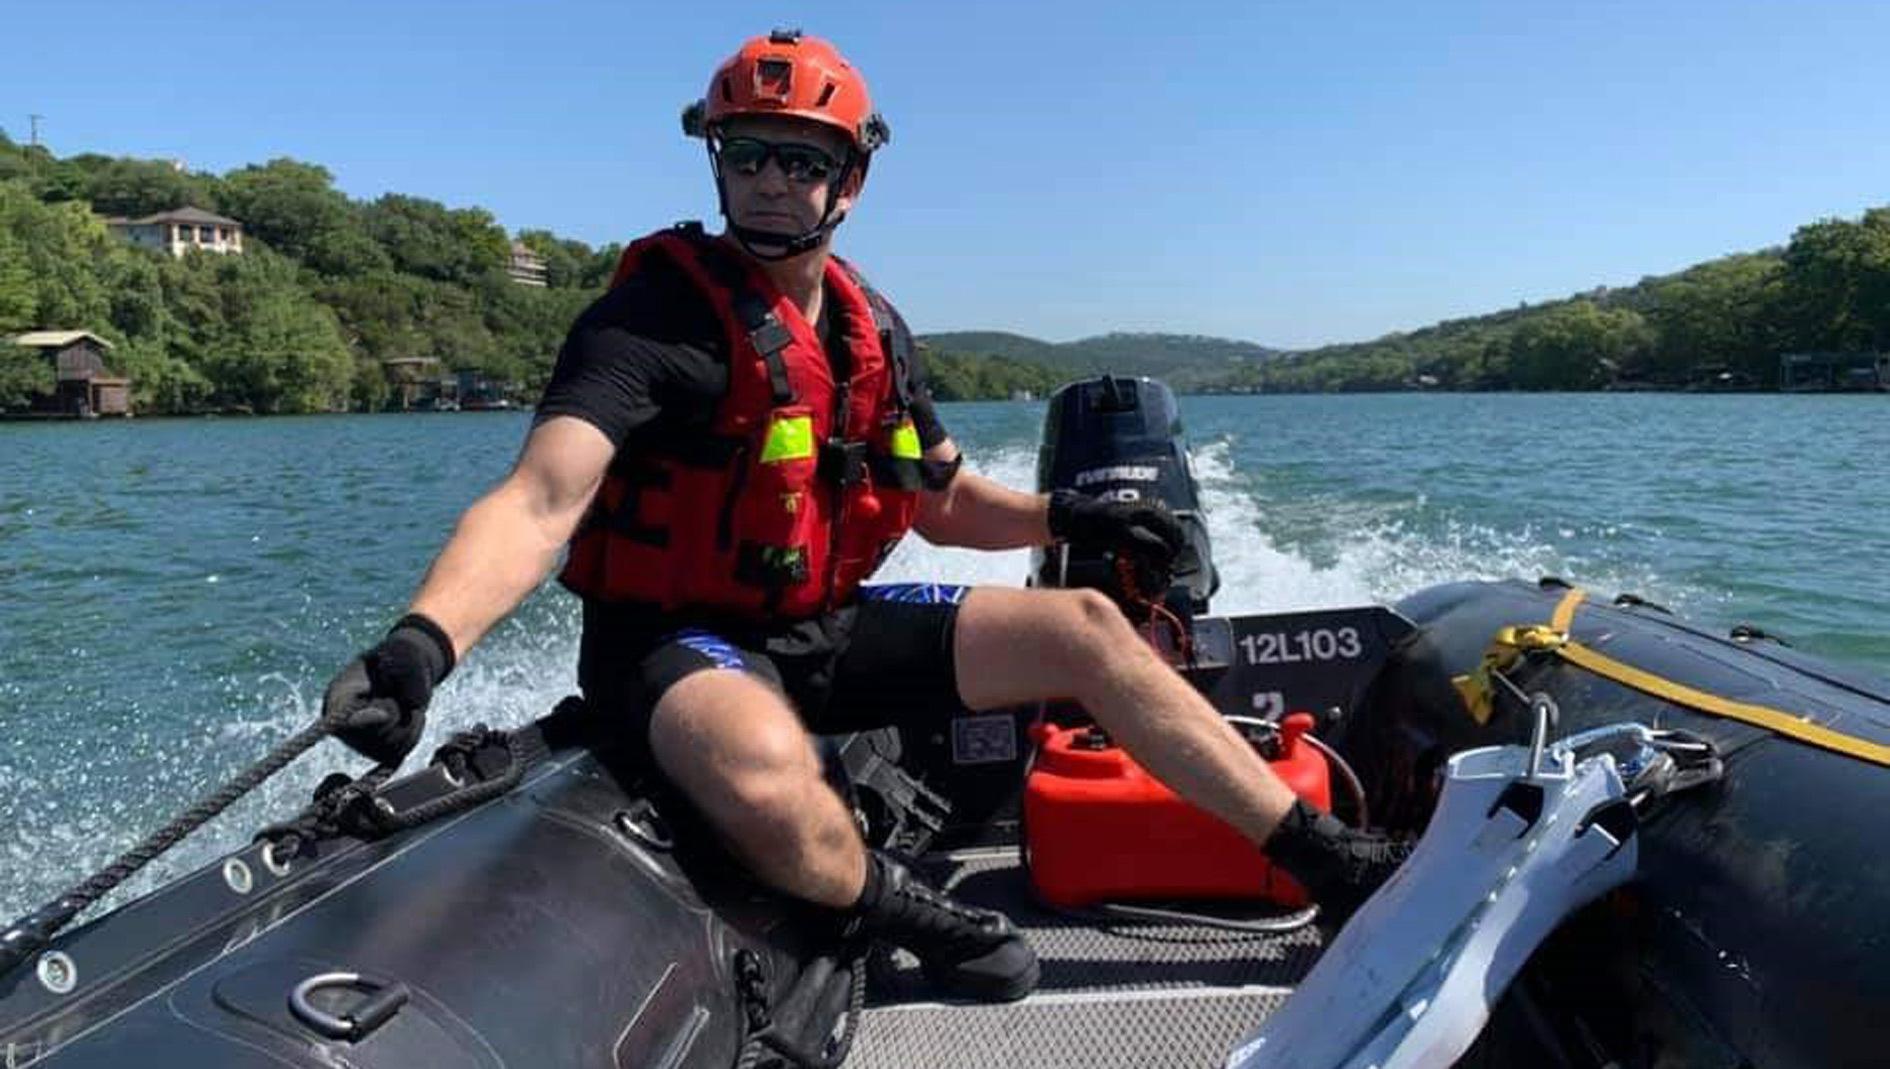 Jason Pickett on EMS duty riding in a boat.